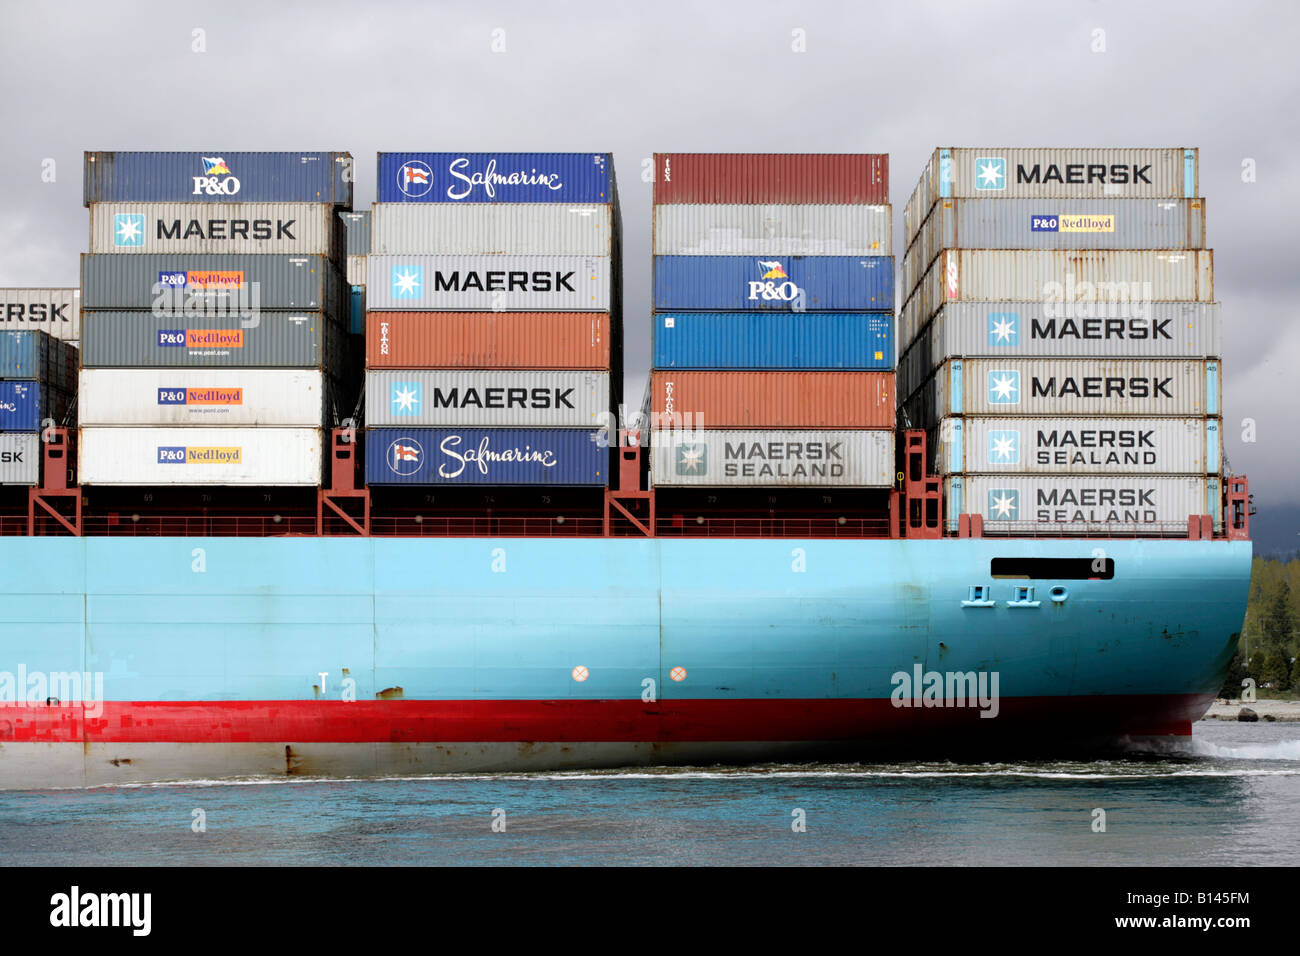 Maersk container ship leaving Vancouver port. (The Sofie Maersk, registered in Copenhagen) - Stock Image